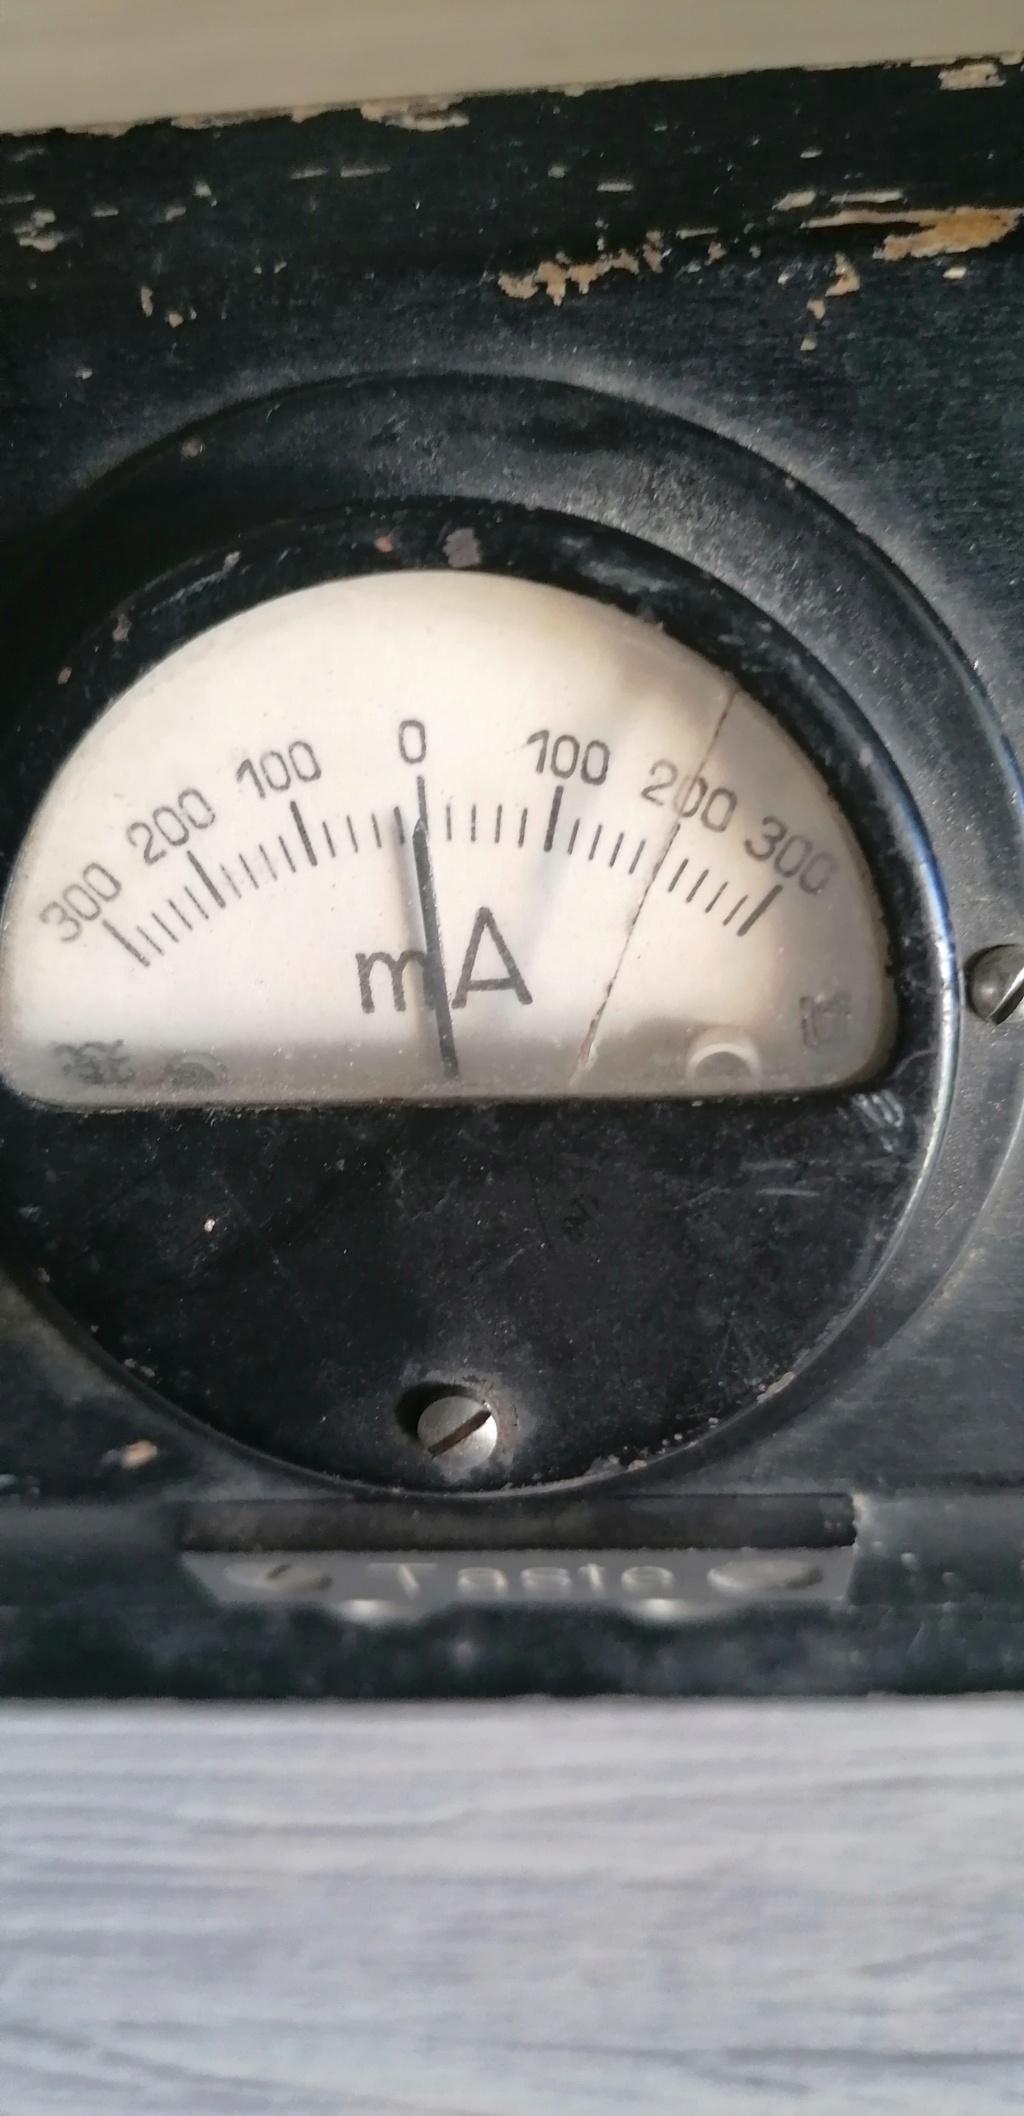 Identification appareil de mesure allemand ww2 Img_2063